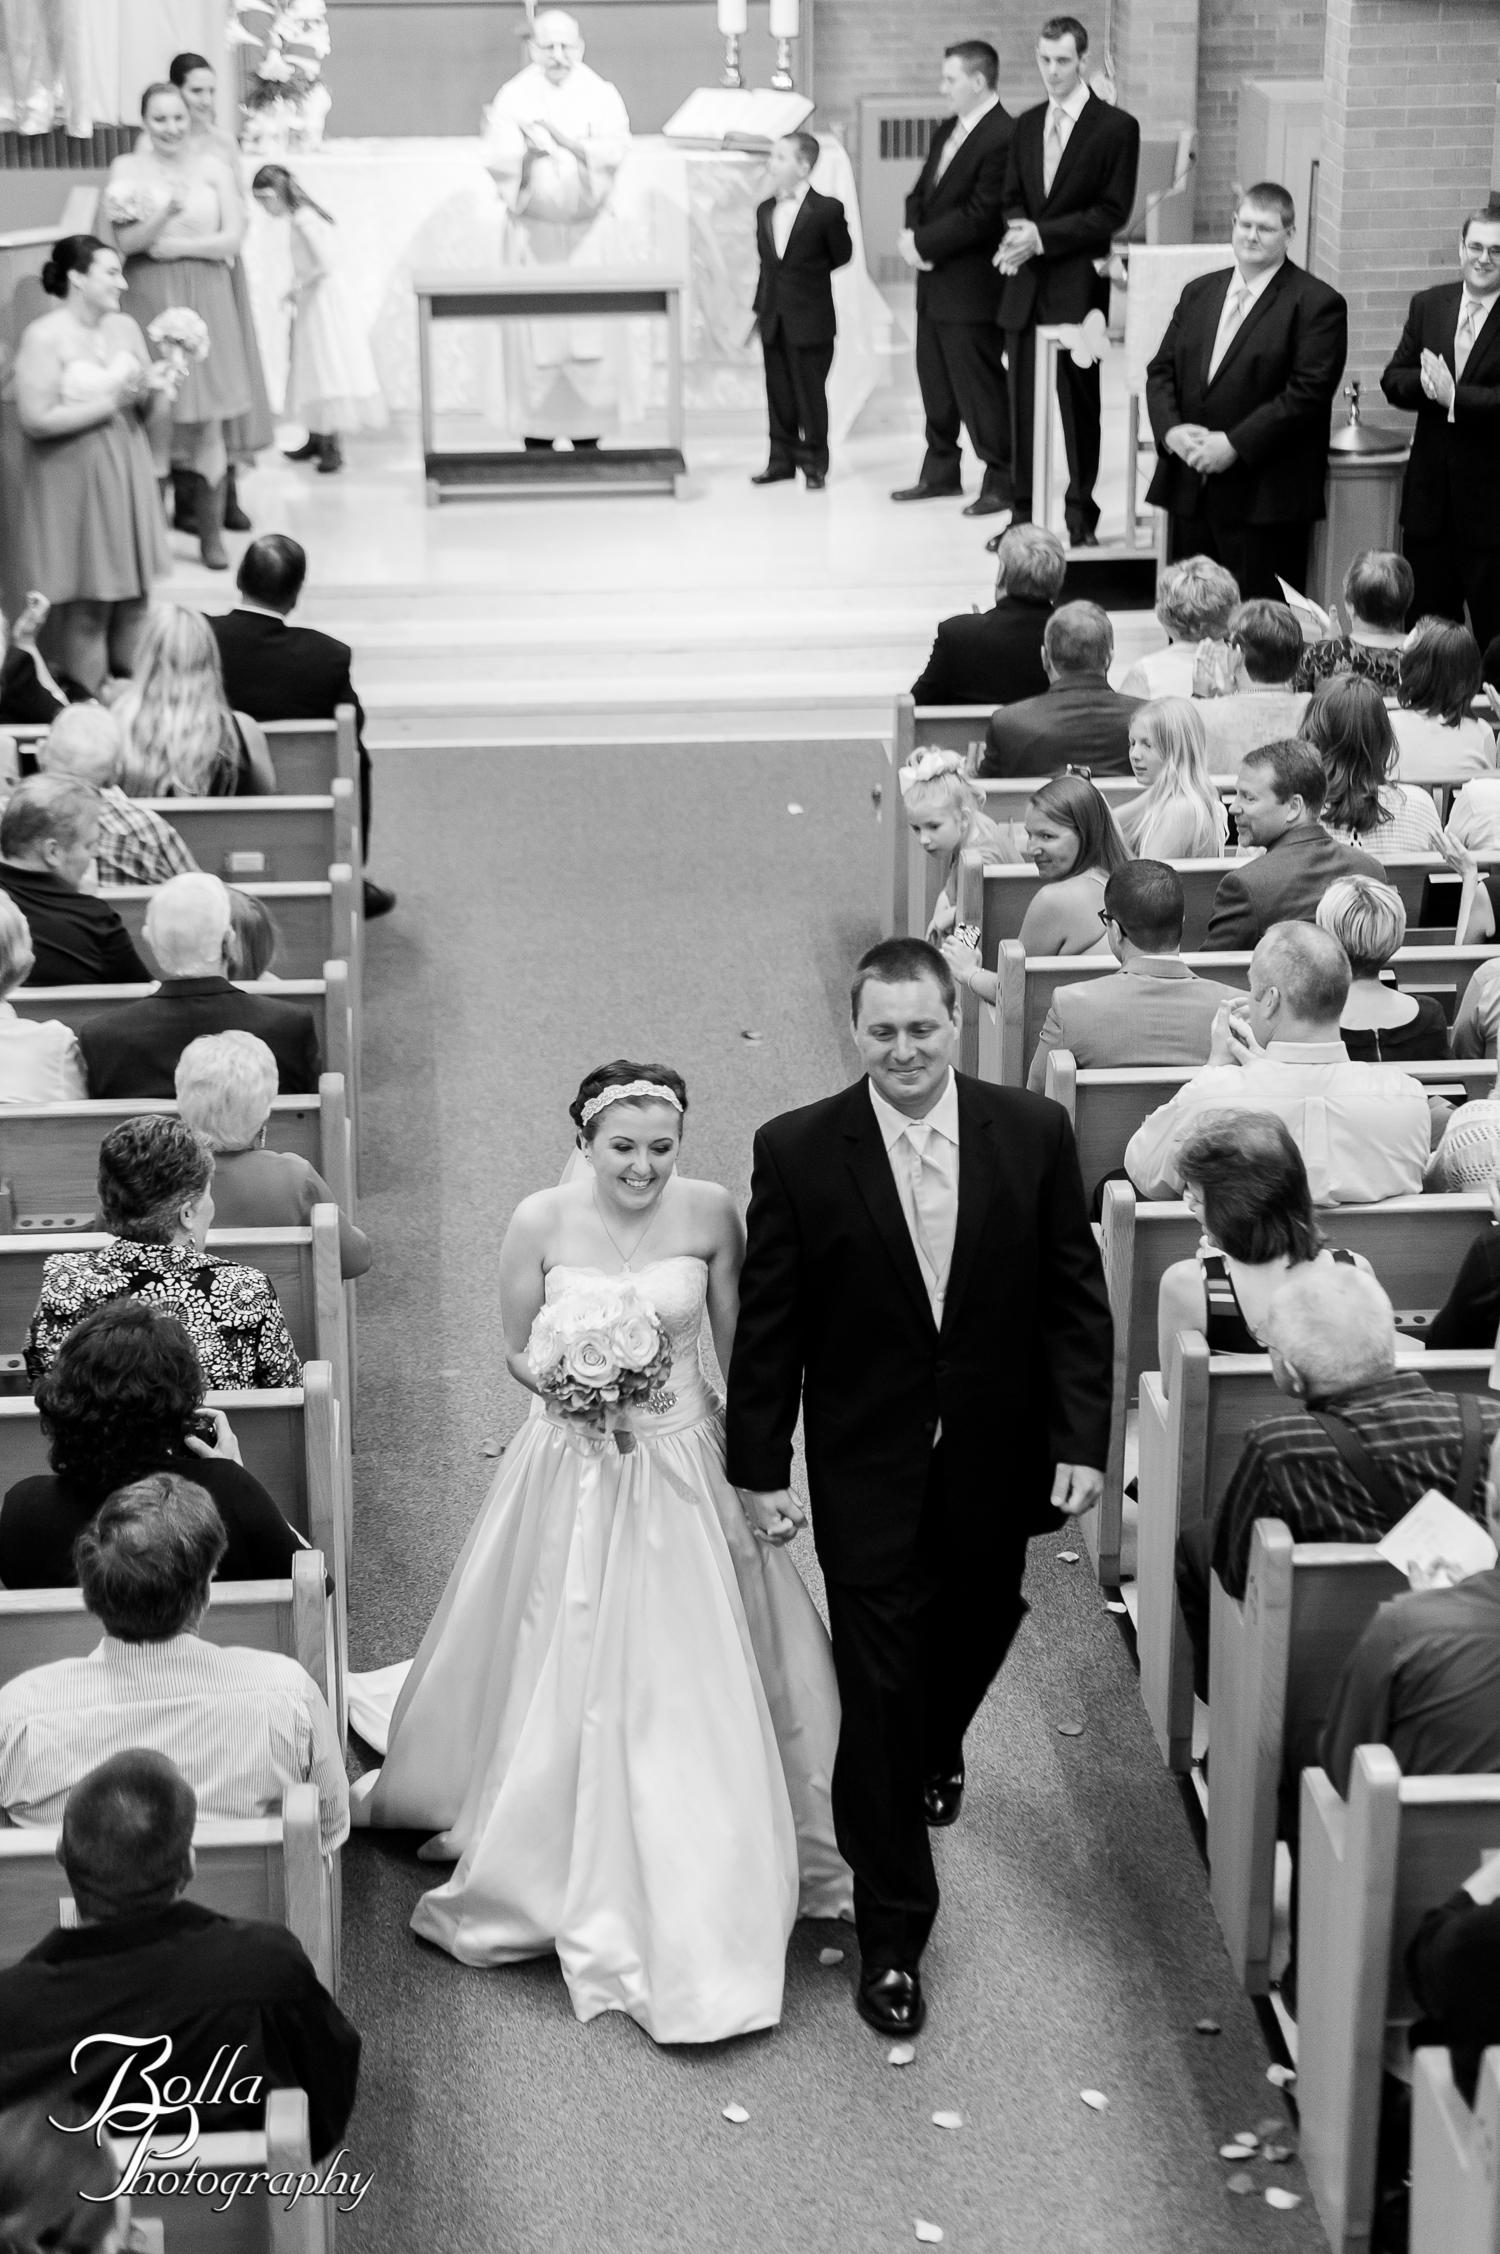 Bolla_Photography_St_Louis_wedding_photographer-2-3.jpg